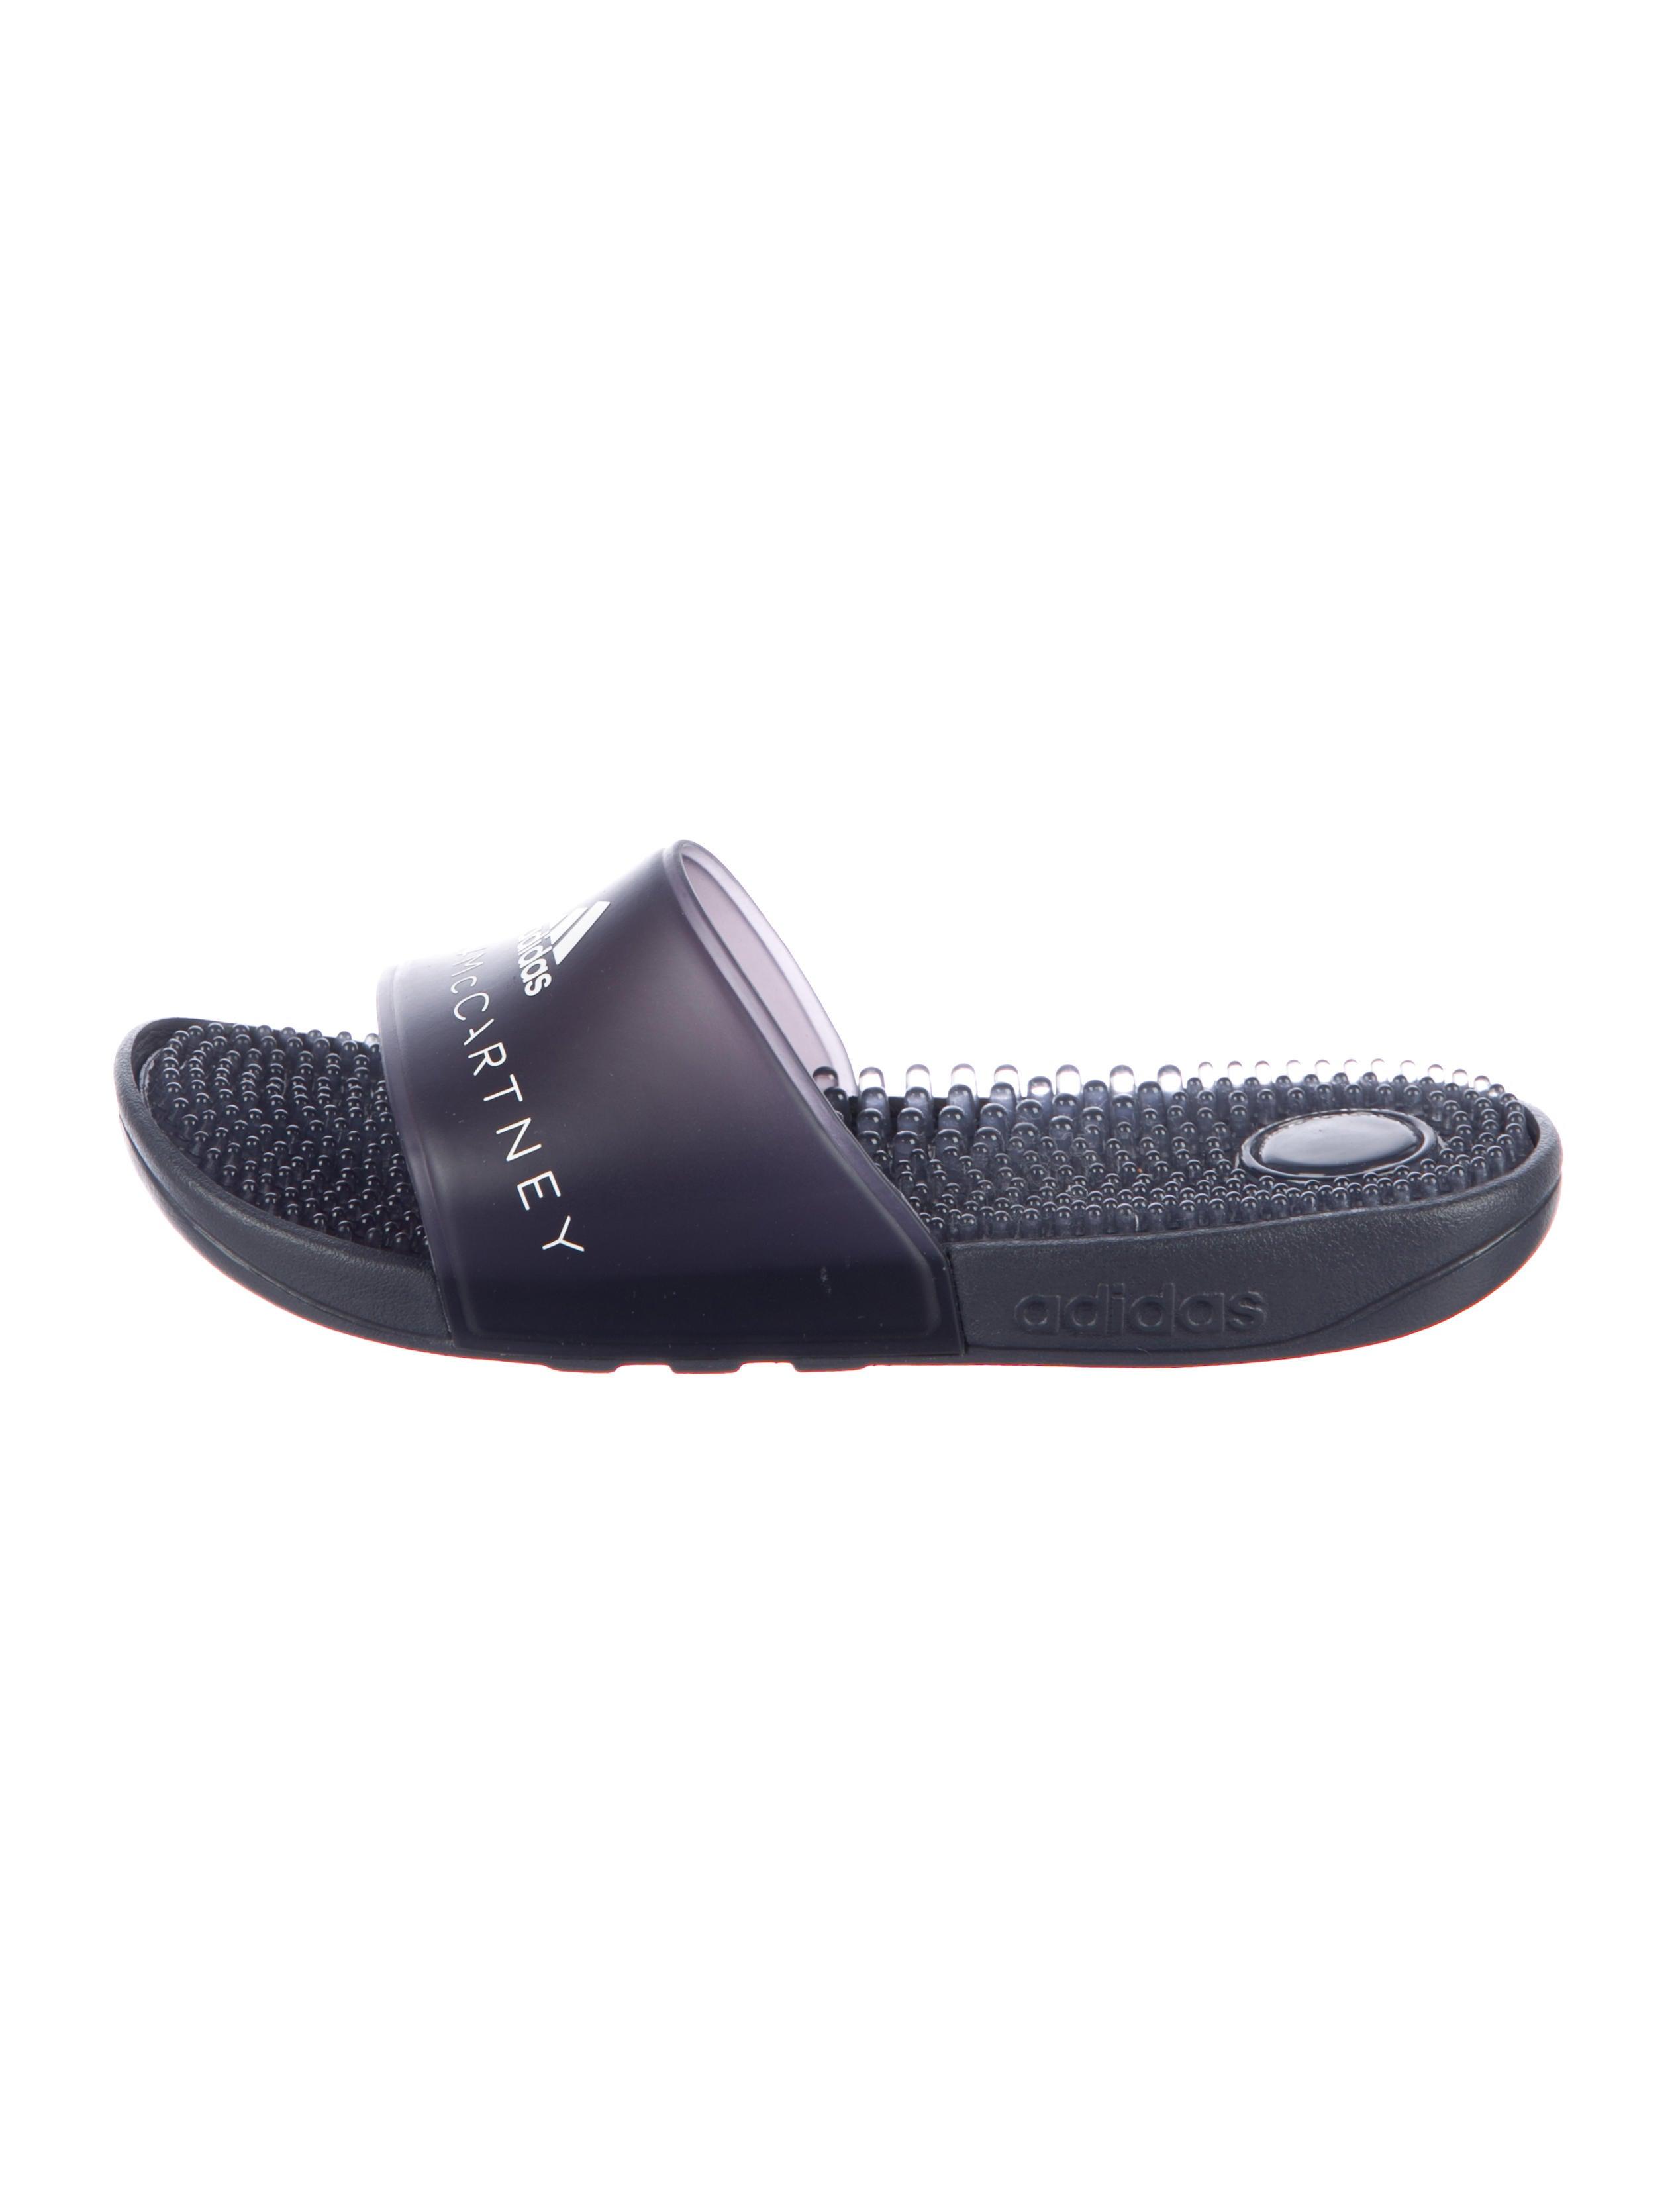 5d9aa9ebeace Stella McCartney for adidas Stella McCartney for Adidas Adisage ...